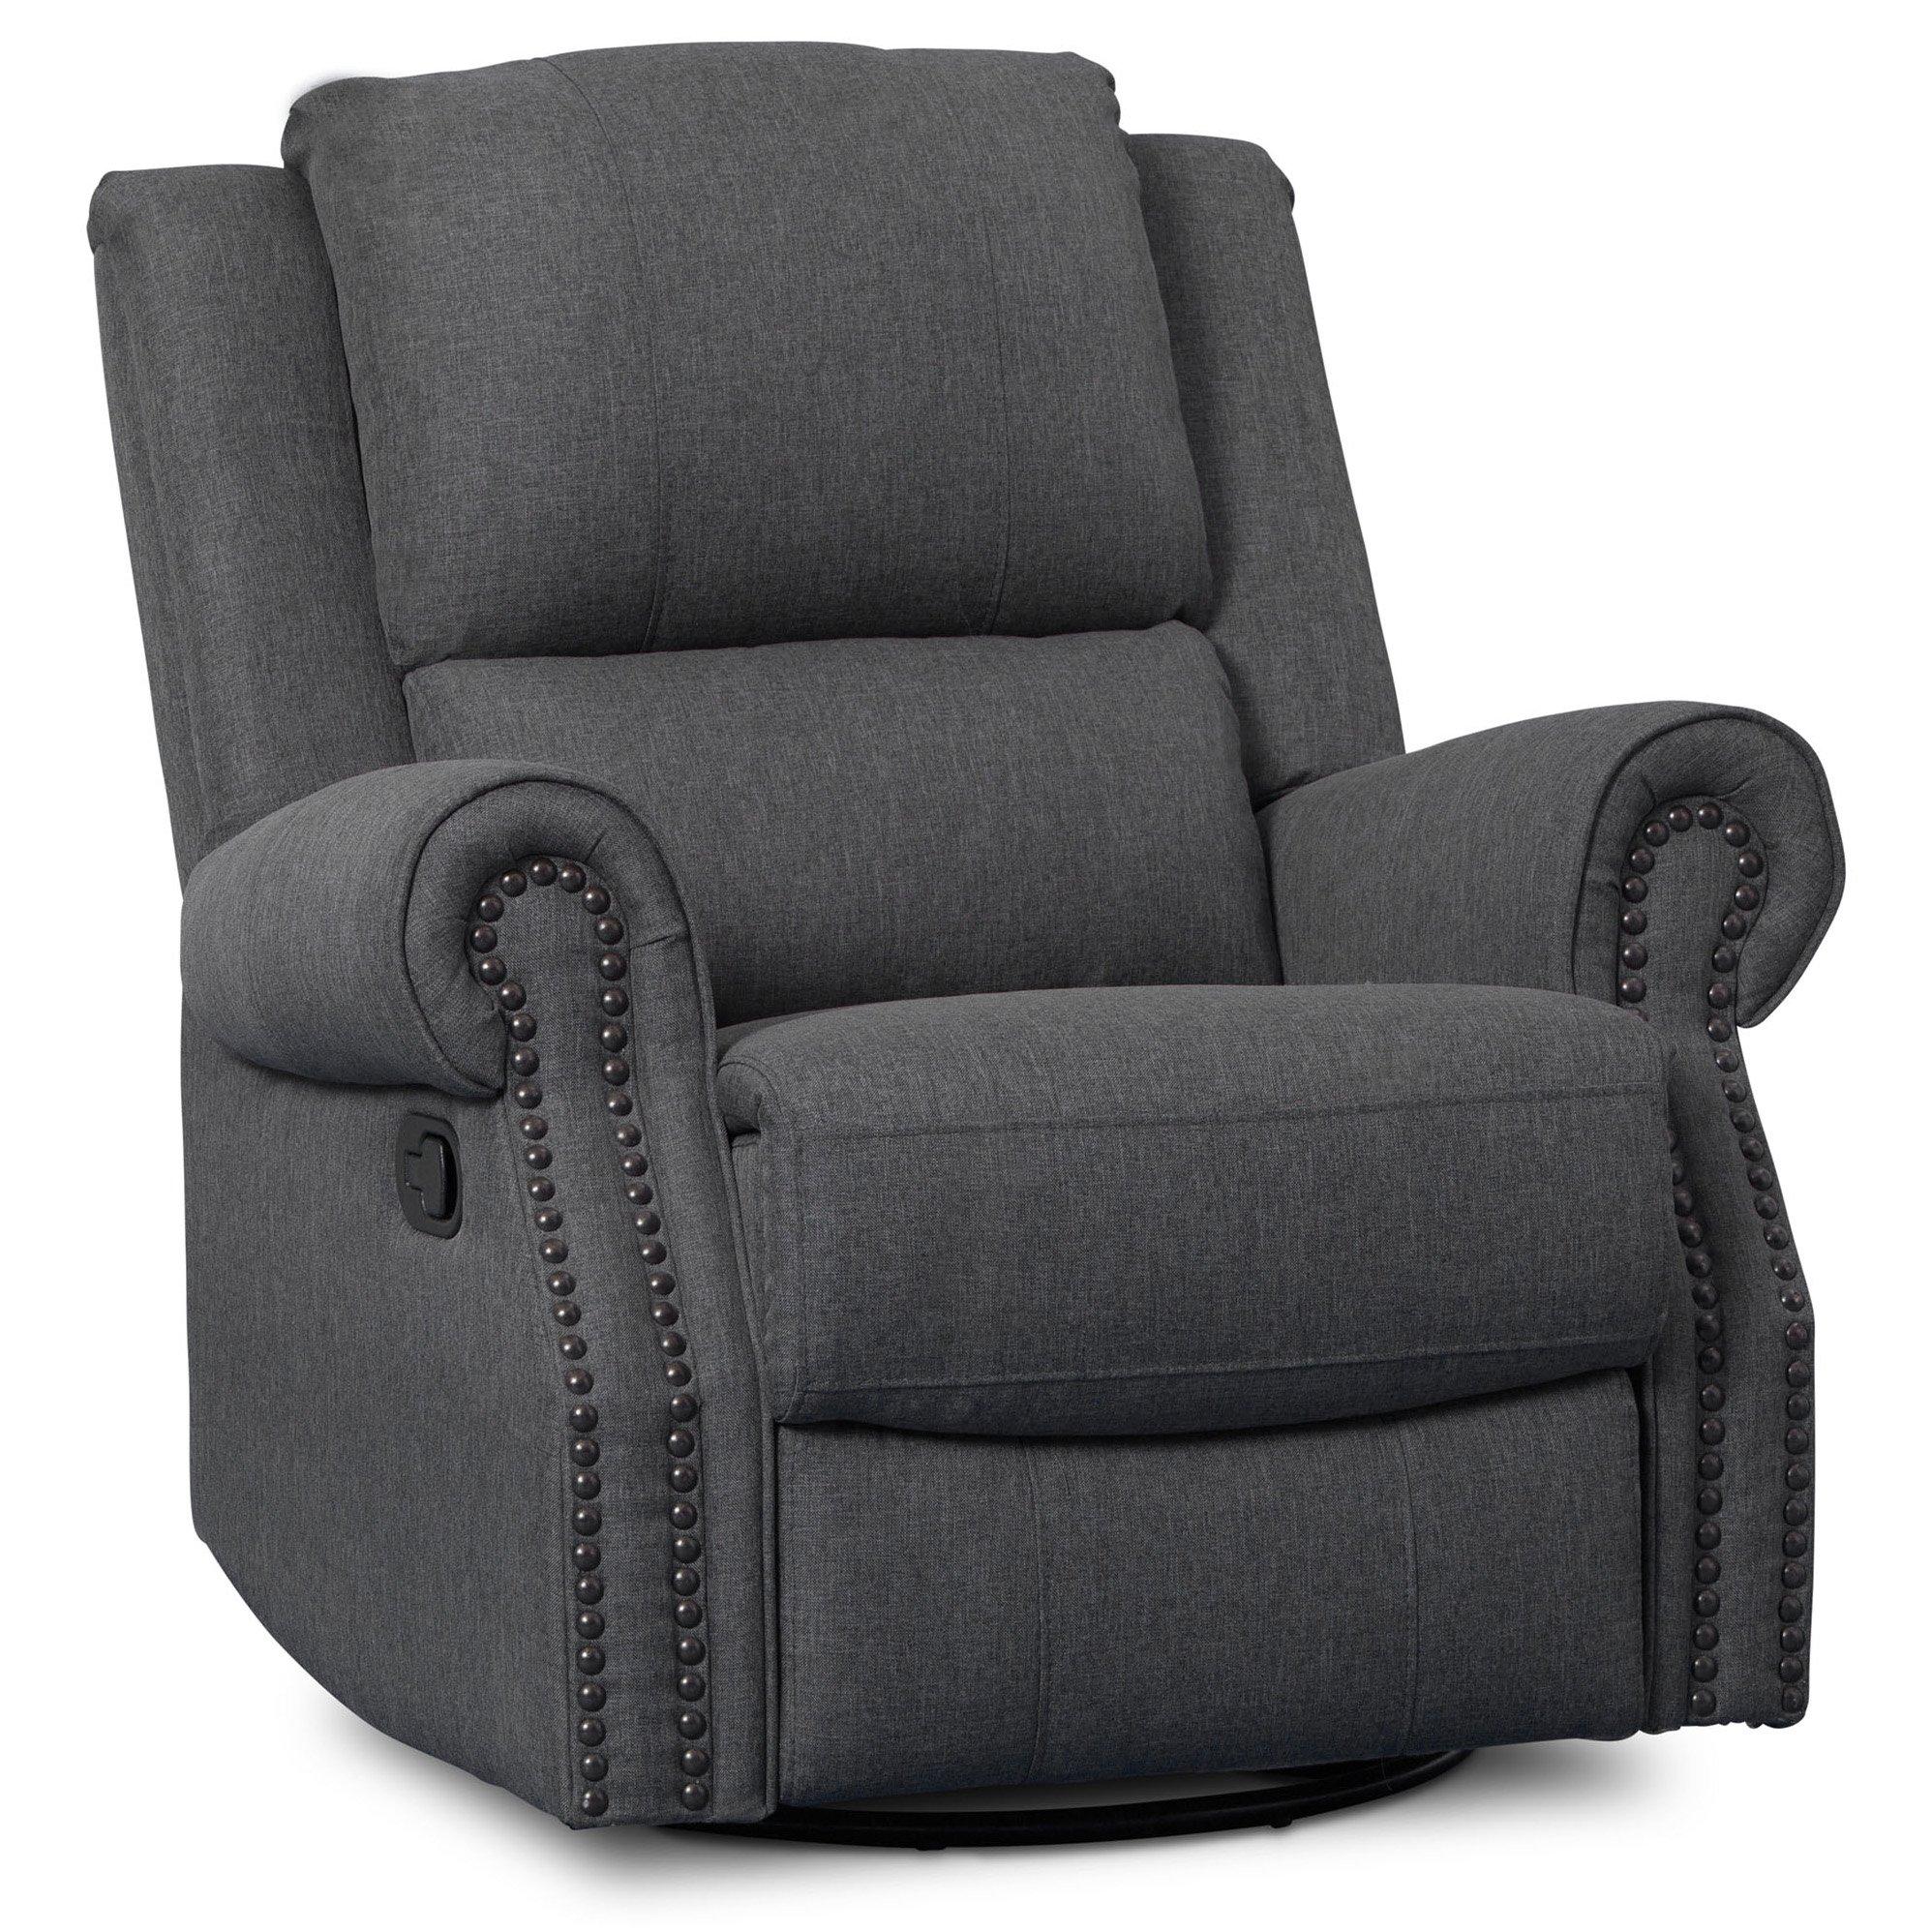 Delta Children Dylan Nursery Recliner Glider Swivel Chair, Charcoal